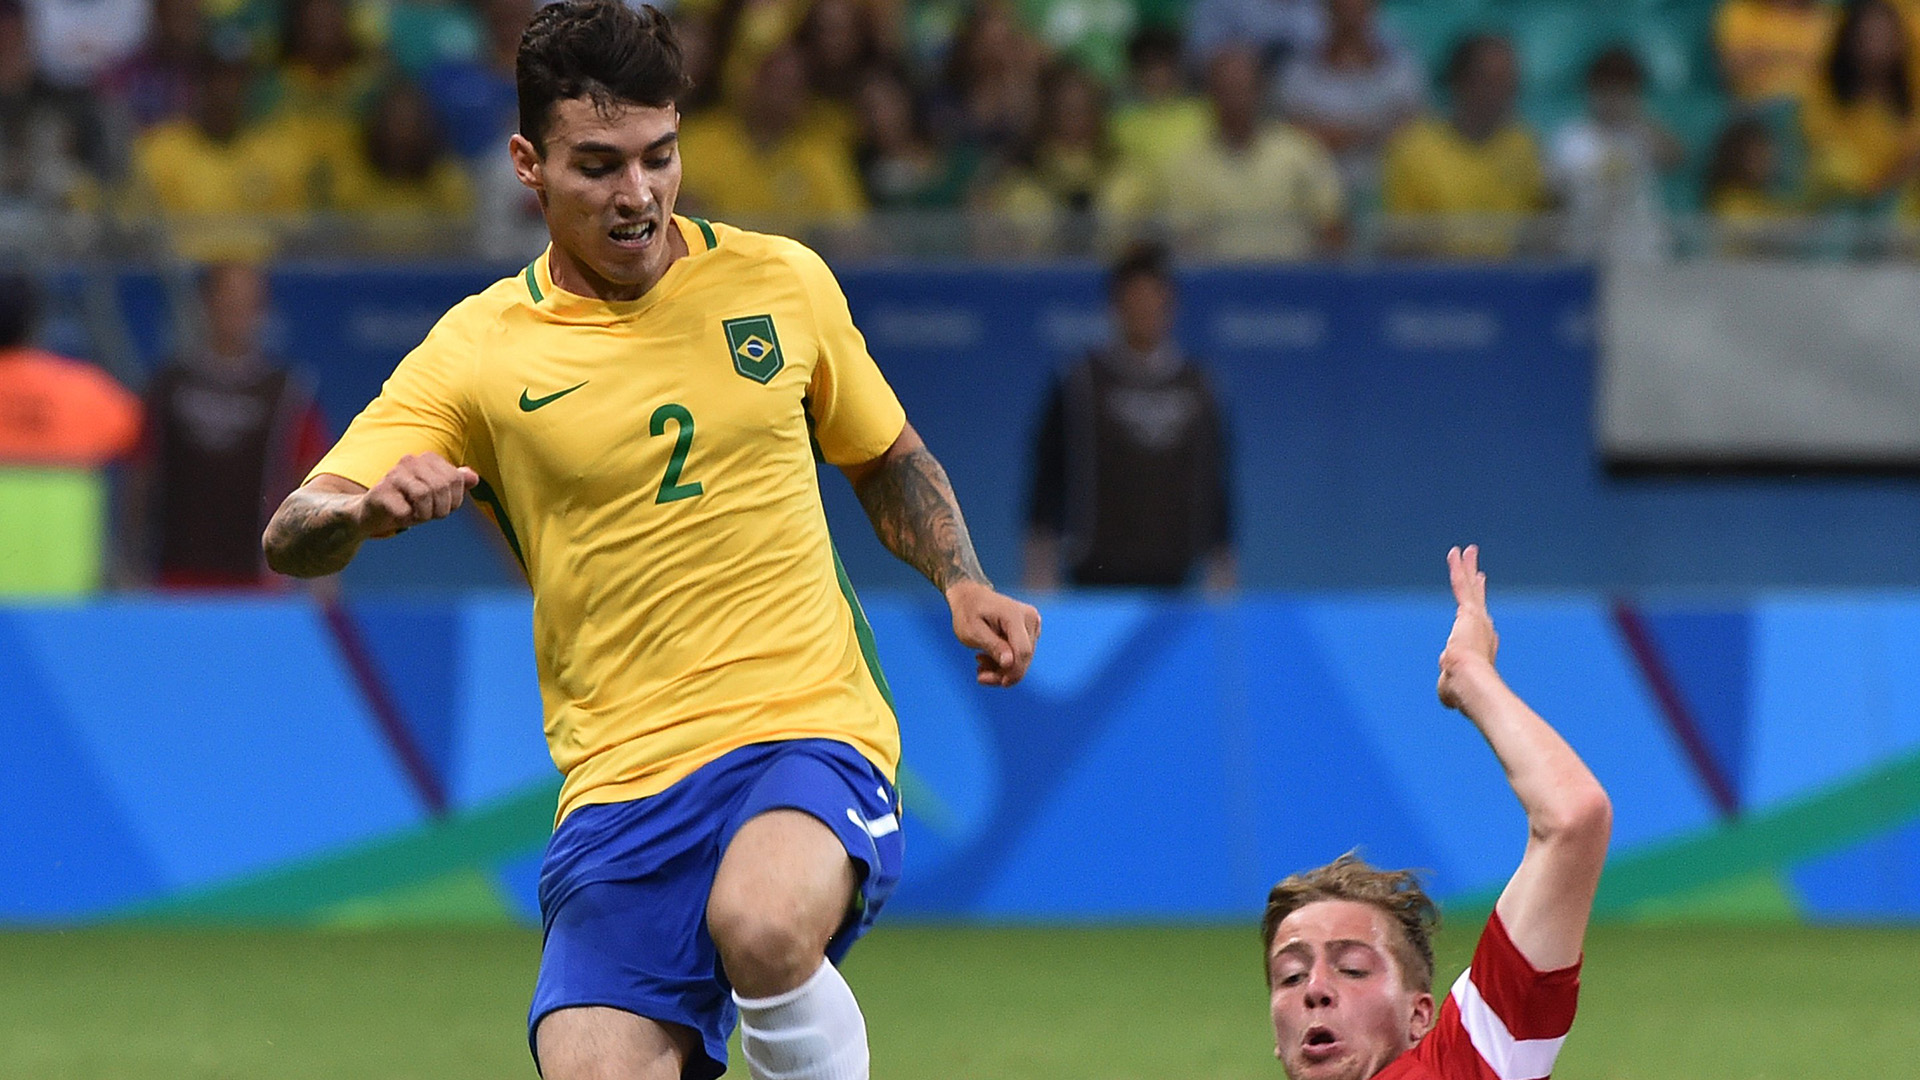 Zeca Denmark Brazil Rio 2016 Olympics 10082016